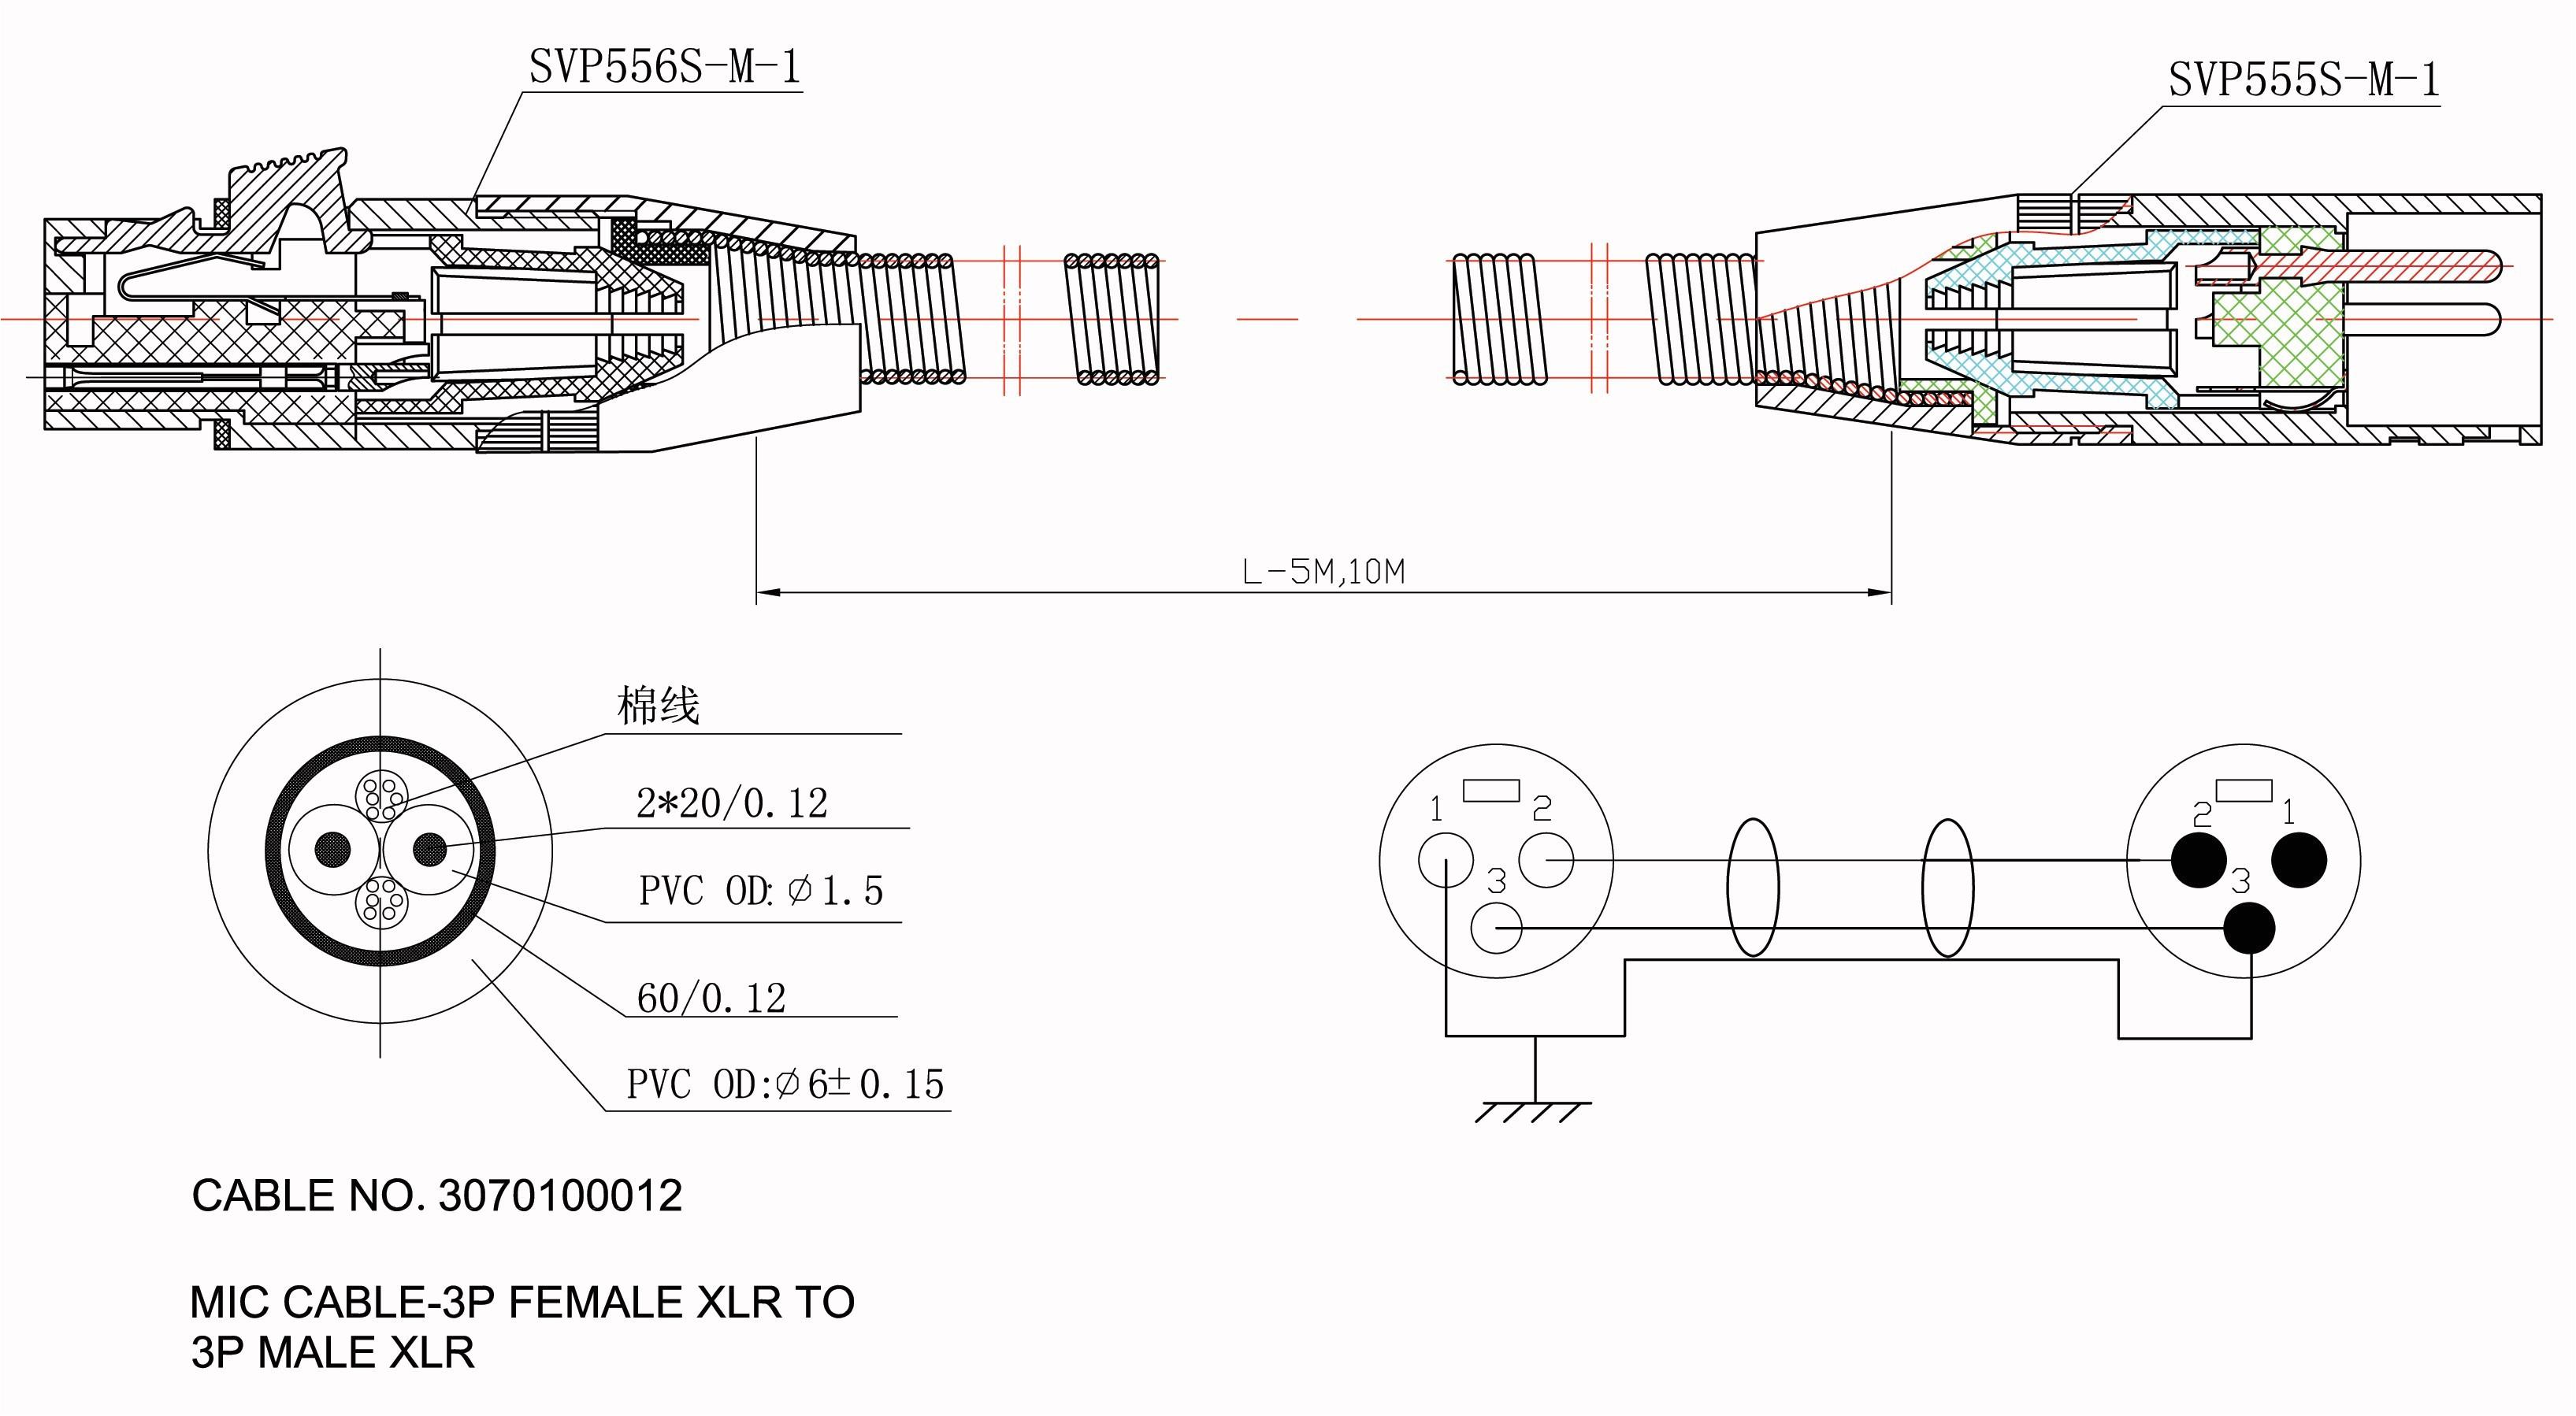 smartgen controller wiring diagram elegant trane air conditioner wiring diagram valid ac ace wiring diagram